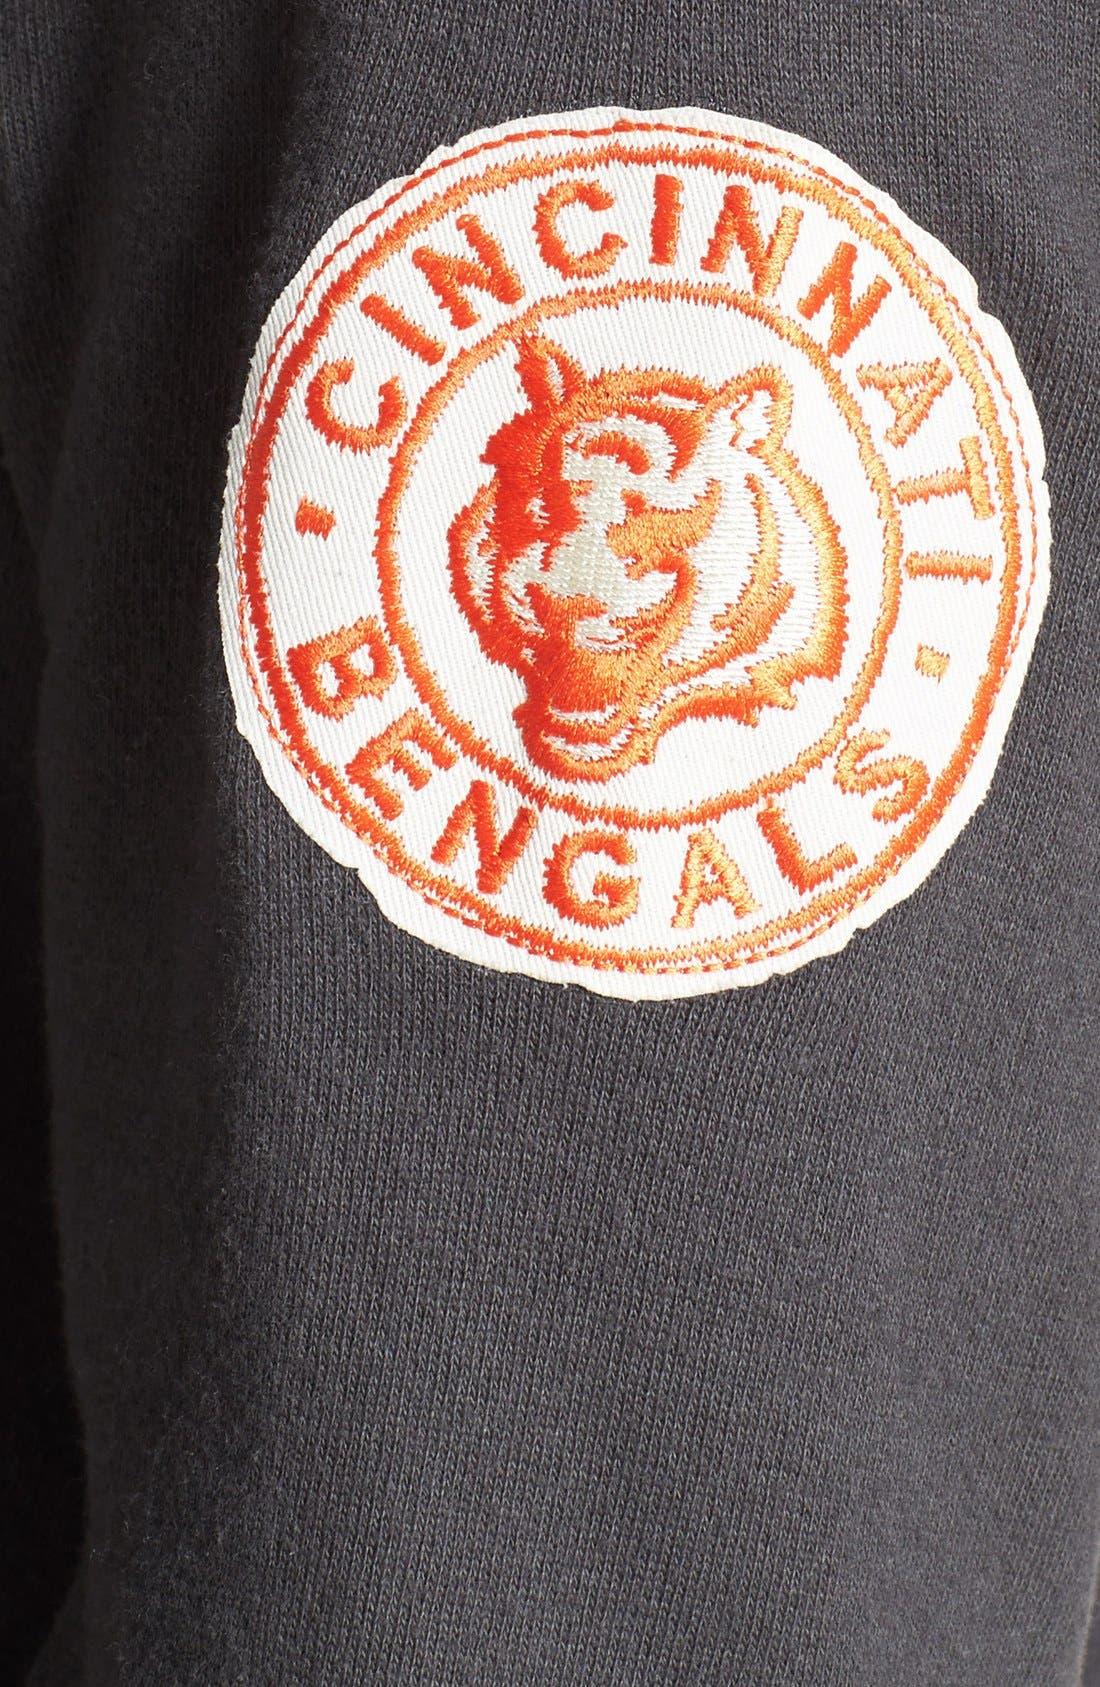 Alternate Image 3  - Junk Food 'Cincinnati Bengals - Field Goal' Crewneck Sweatshirt